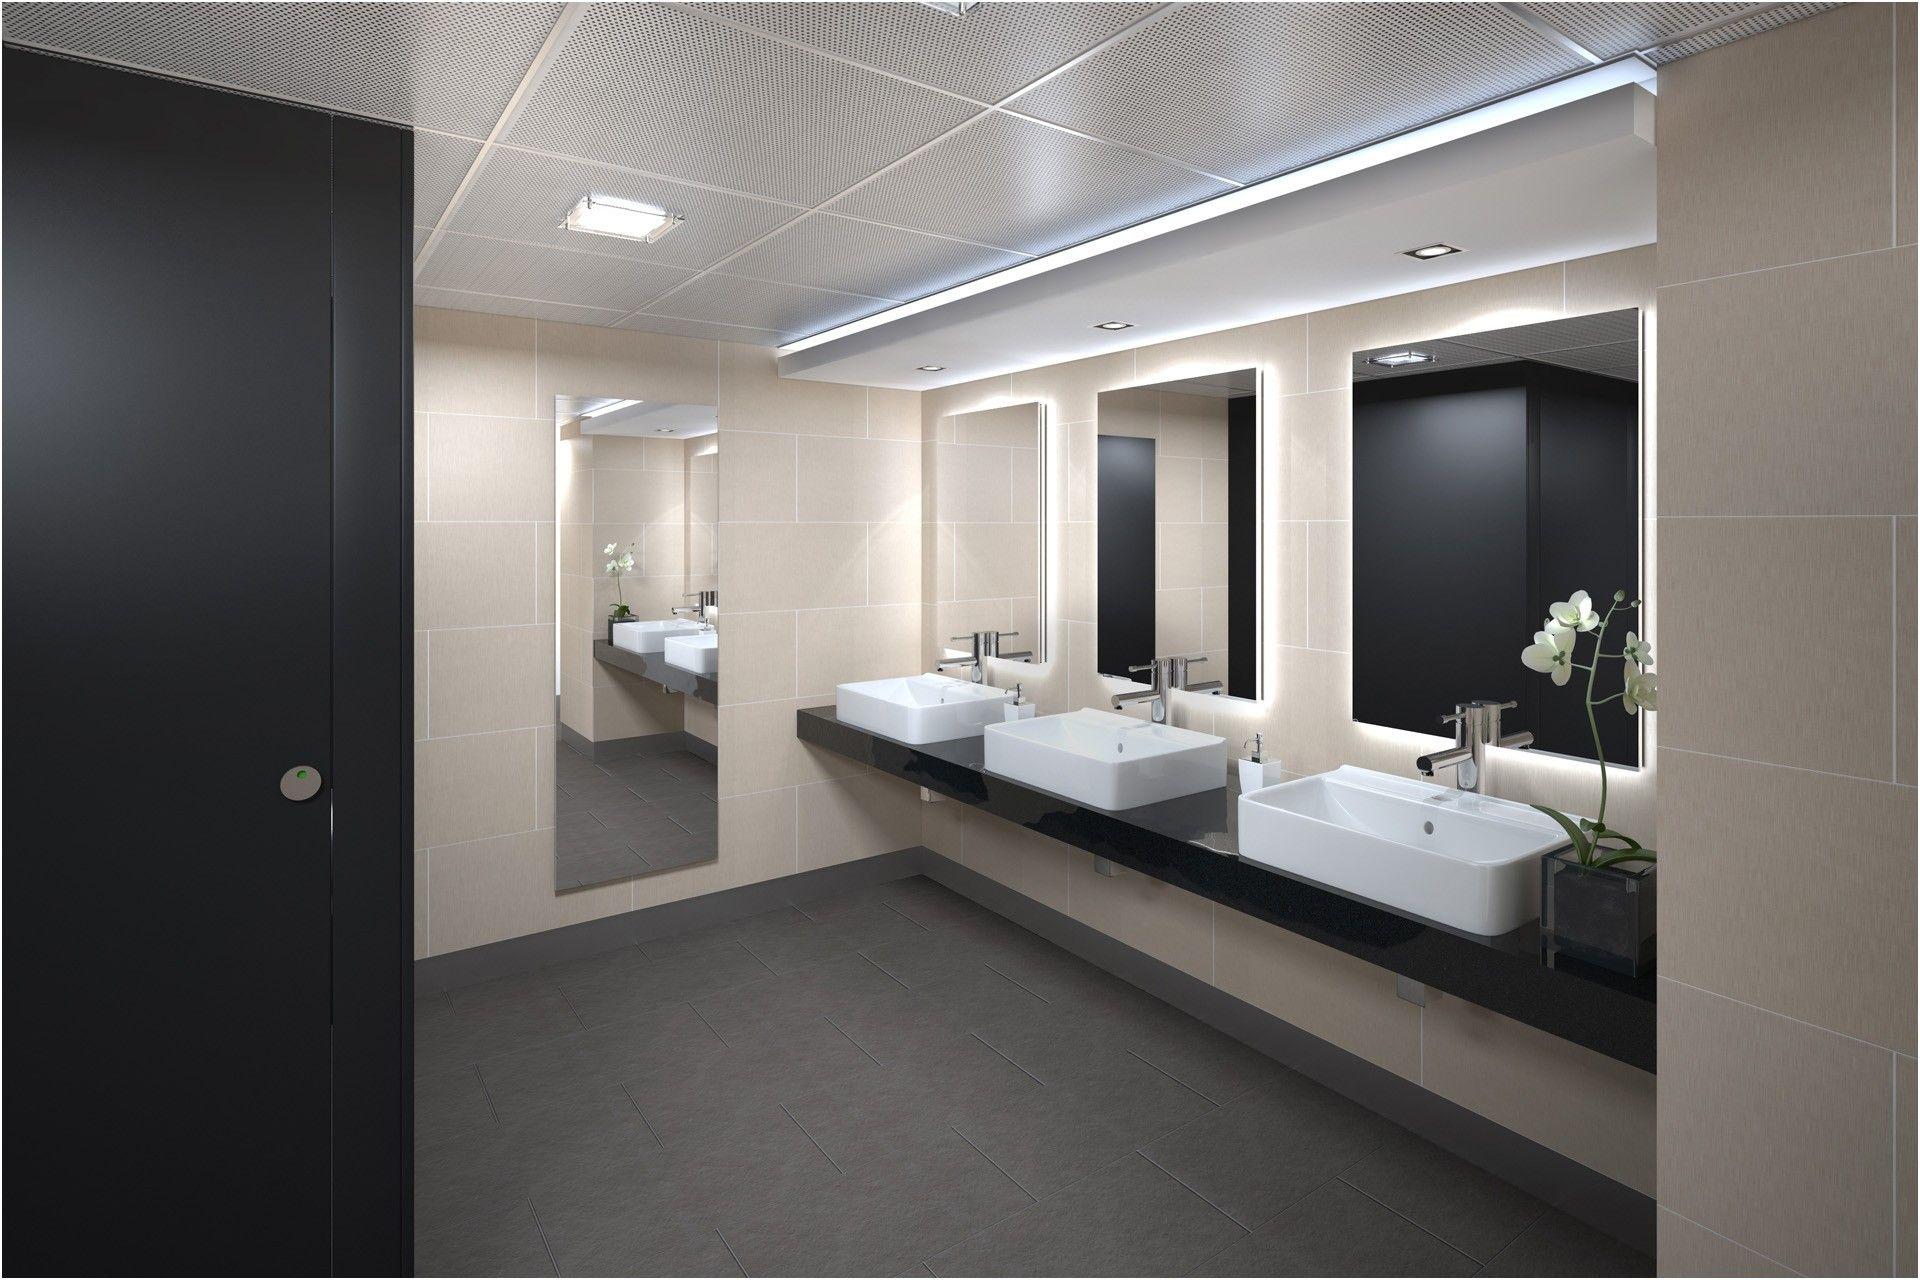 Commercial Bathroom Design Inspiration Mercial Bathroom Ideas Mercial Bathroom Lights In Drop From Design Decoration